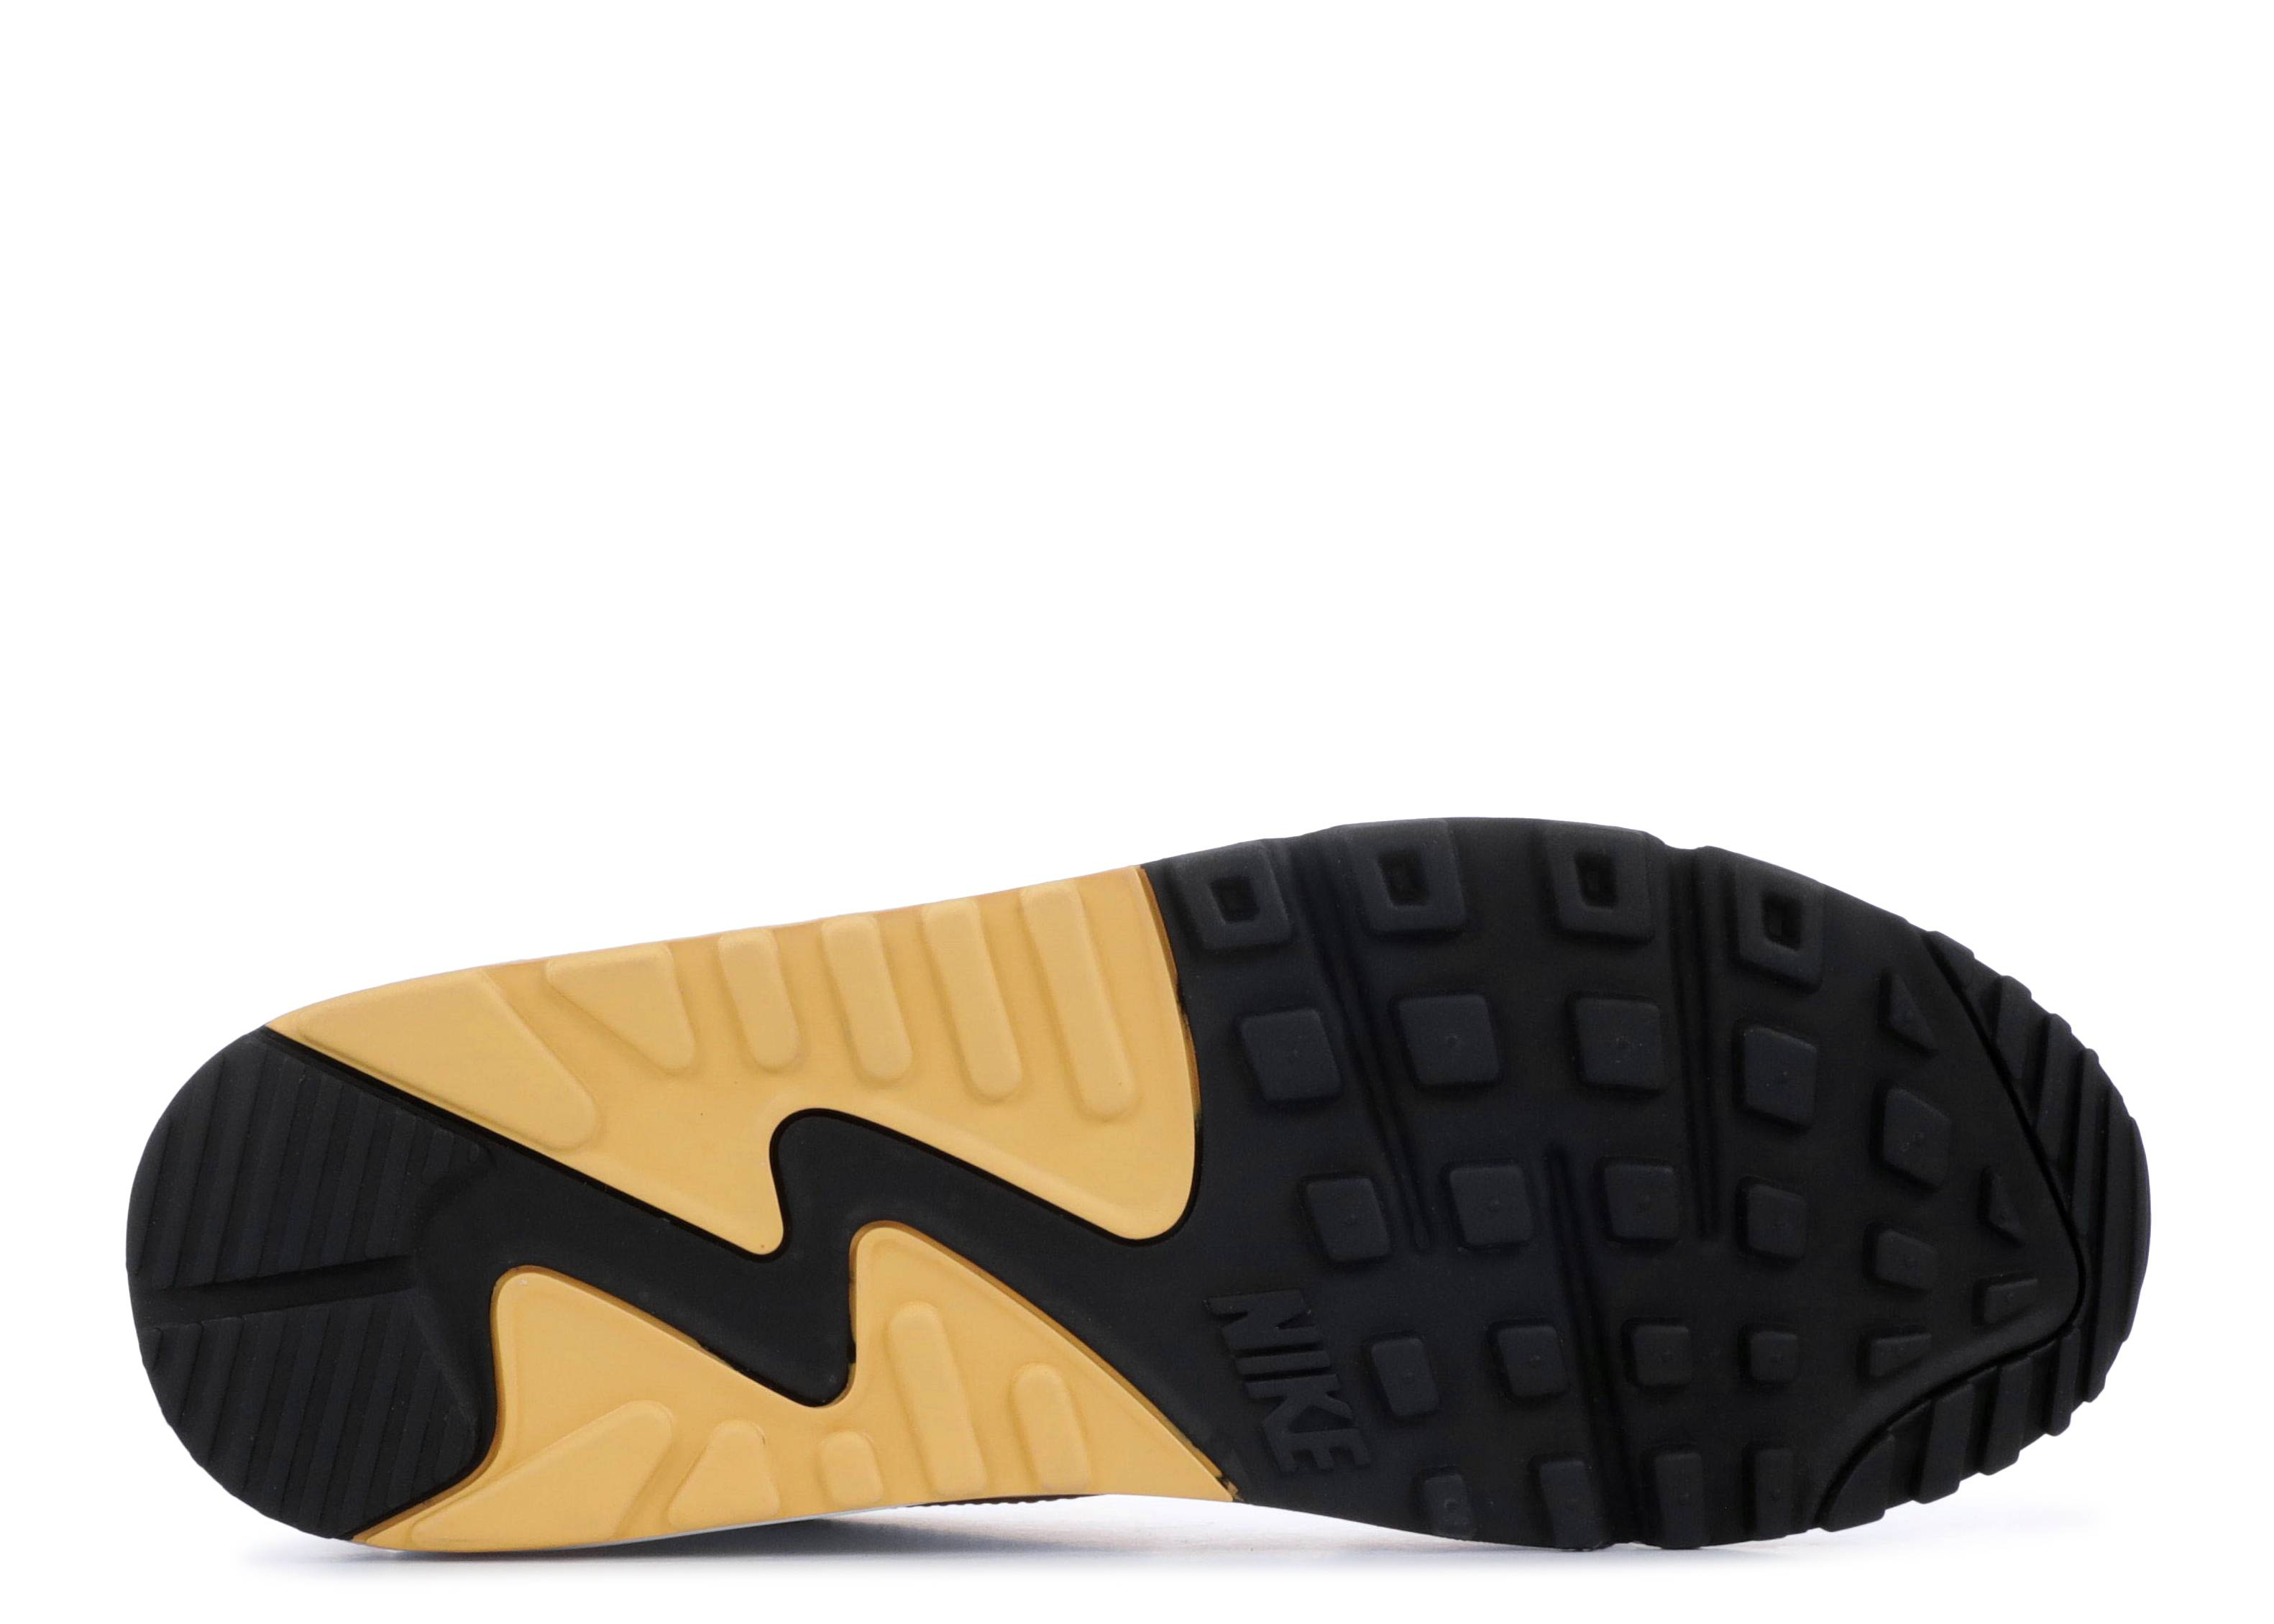 promo code 99f75 3bd68 Air Max 90 1 - Nike - aj7695 102 - white metallic gold-black   Flight Club